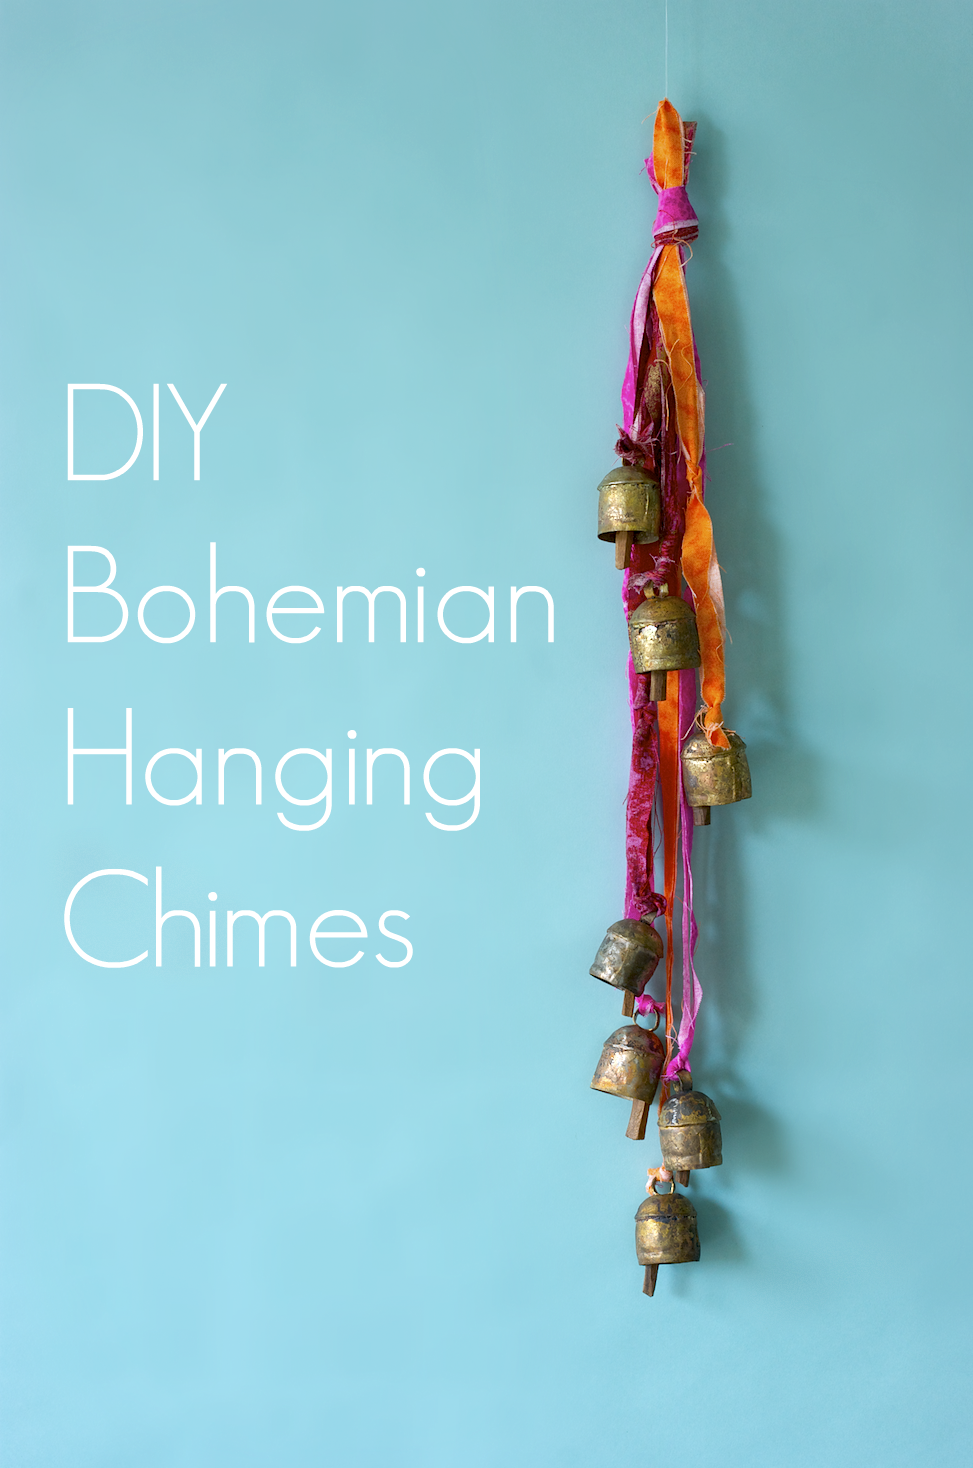 DIY Bohemian Hanging Chimes via A Charming Project